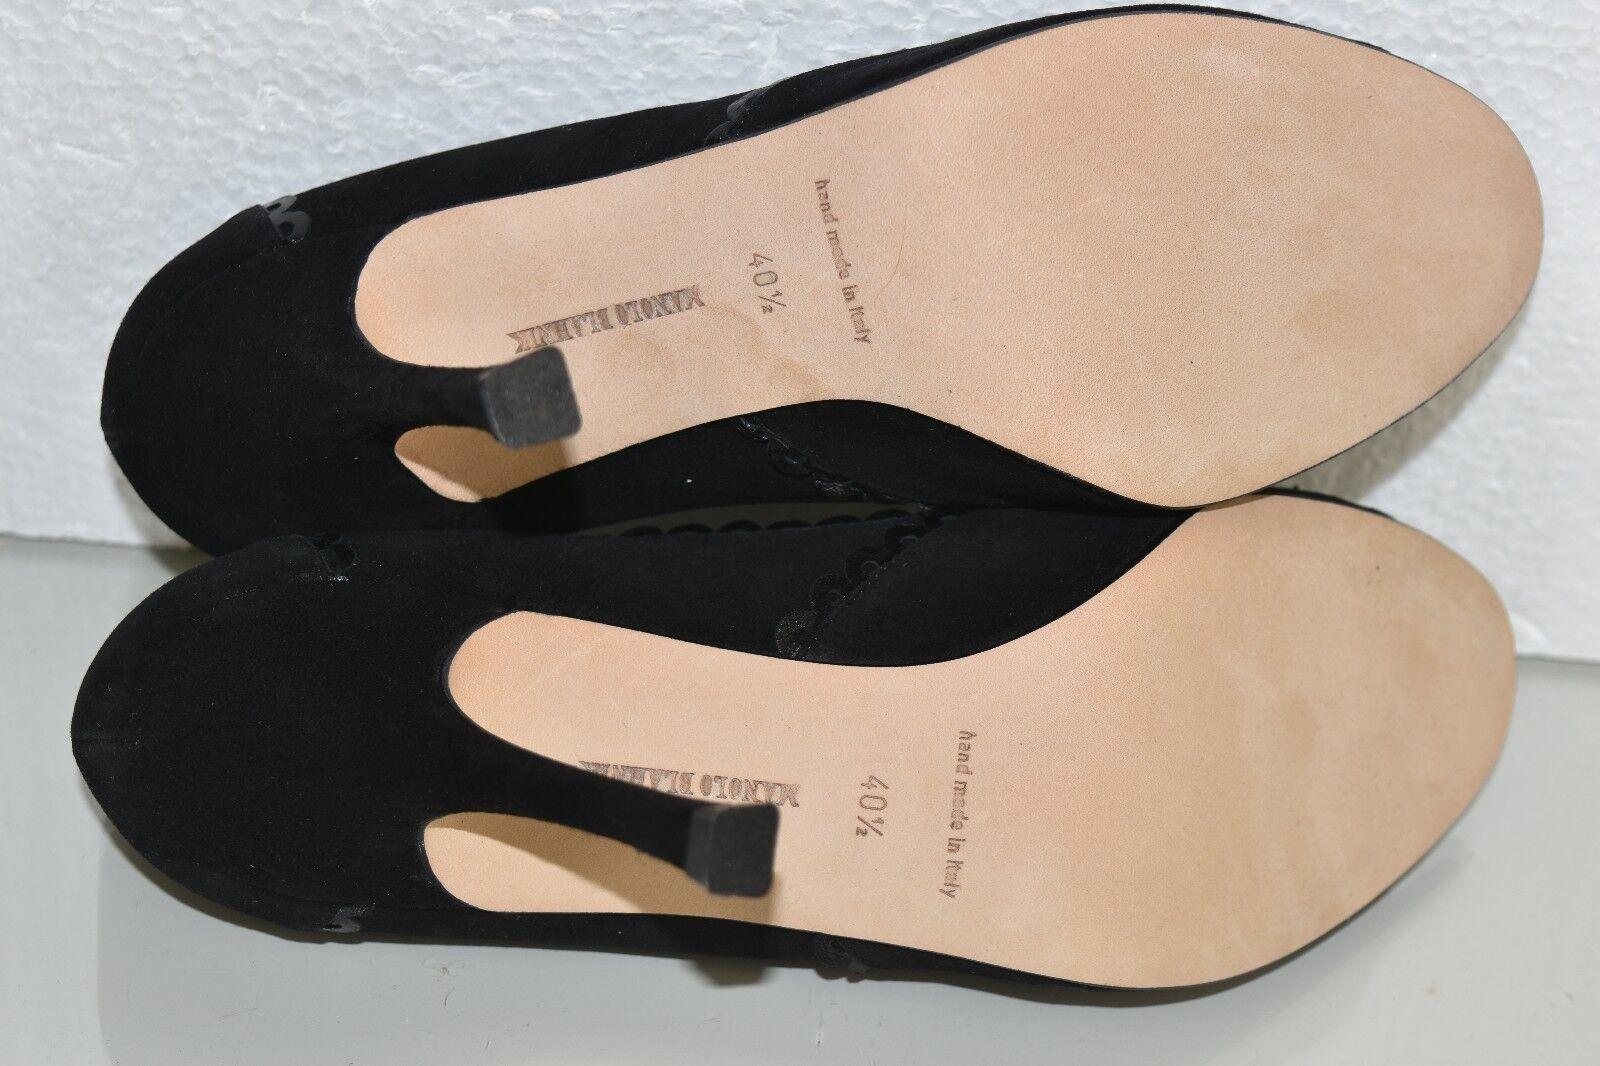 NEW Manolo Blahnik HENRI 105 105 105 Peep Toe Suede Heels Pumps Black Leather shoes 40.5 8ed632